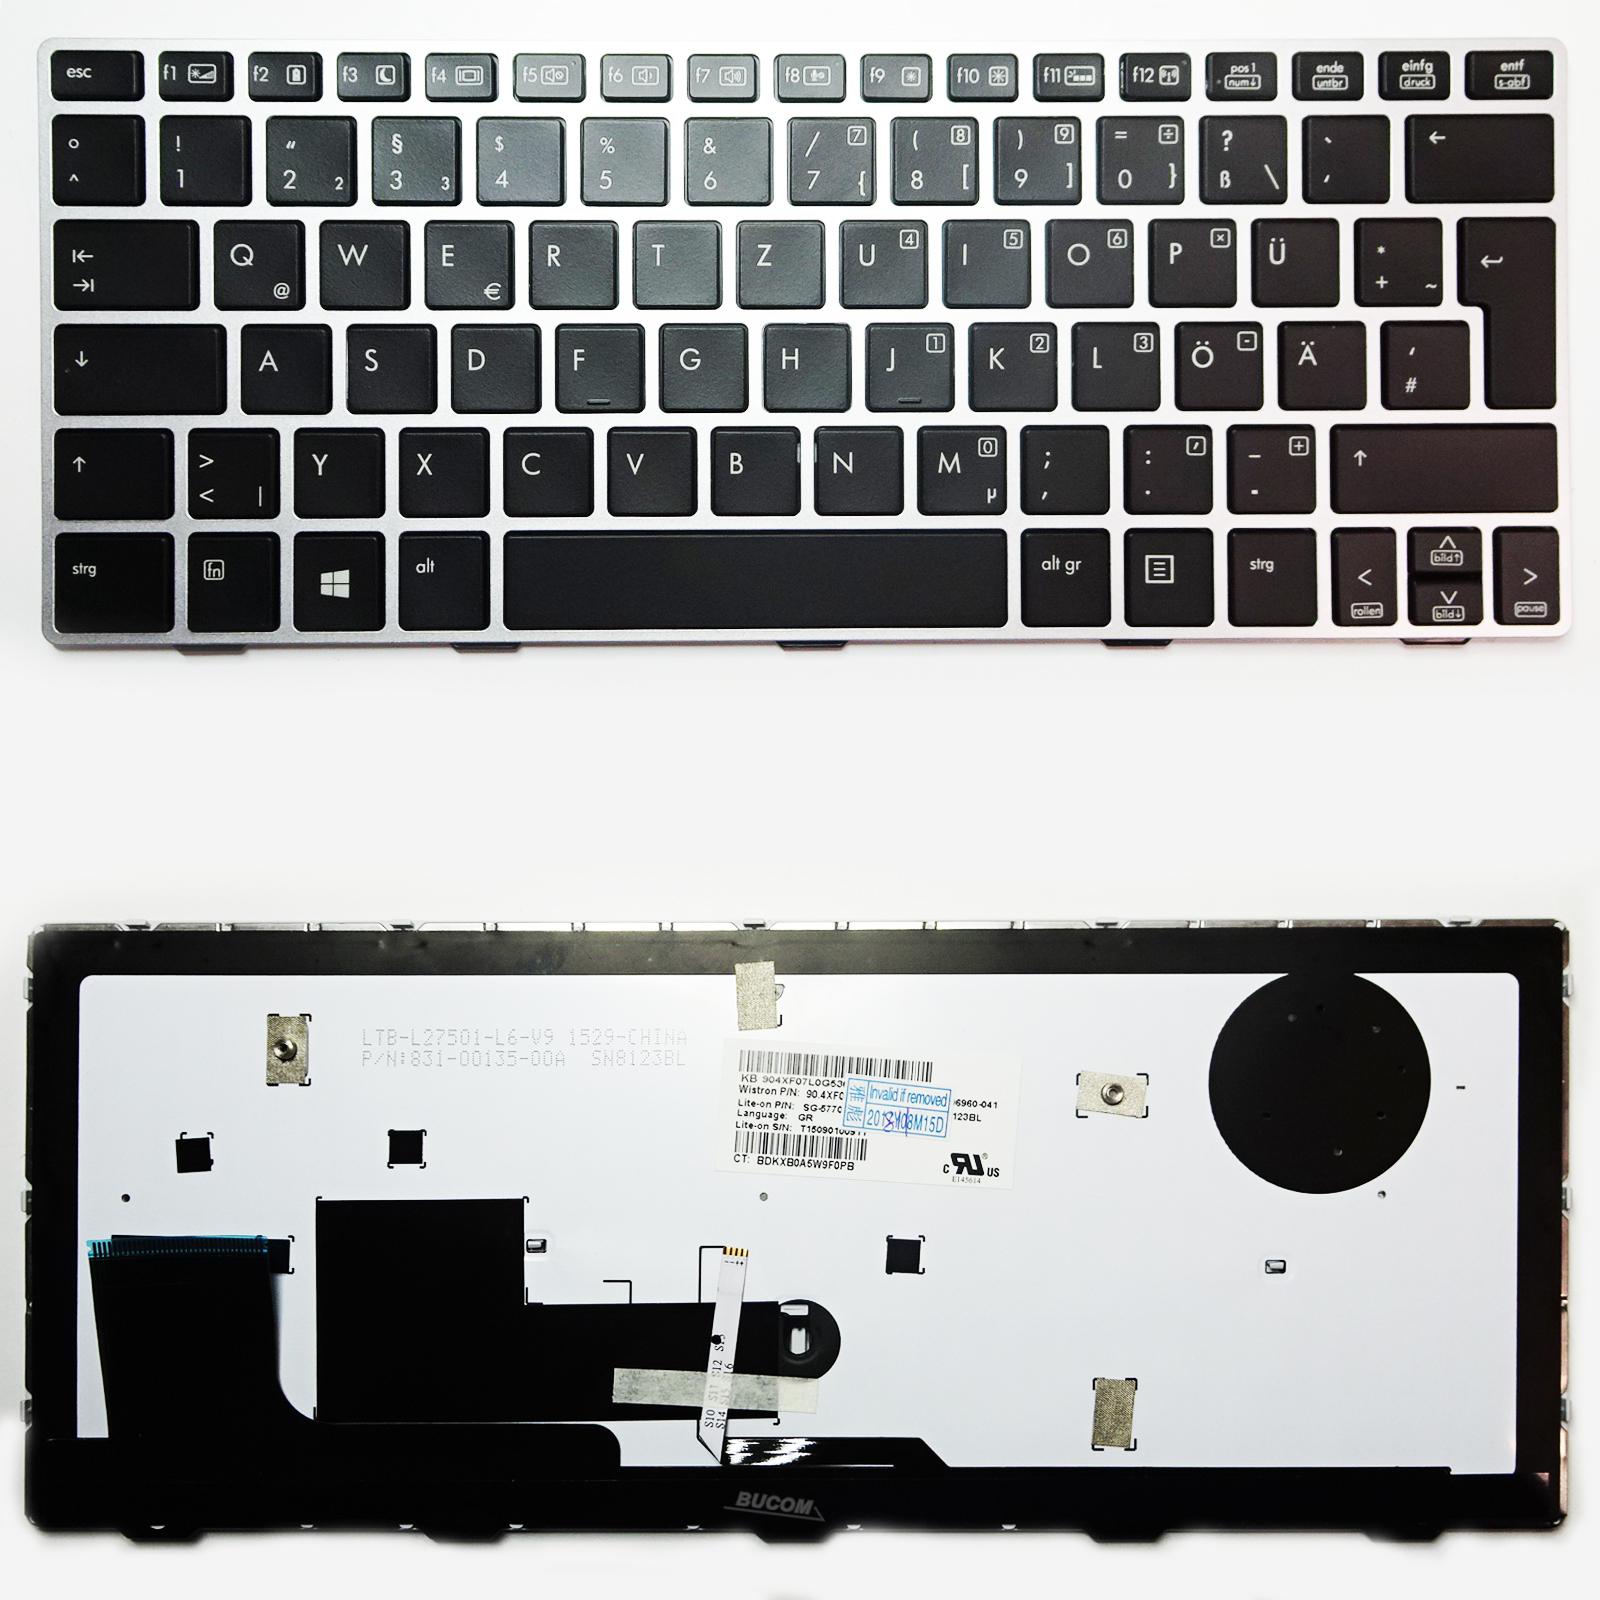 Bucom Tastatur f/ür HP EliteBook Revolve 810 G1 G2 G3 DE QWERTZ Keyboard mit Beleuchtung 11,6 Zoll